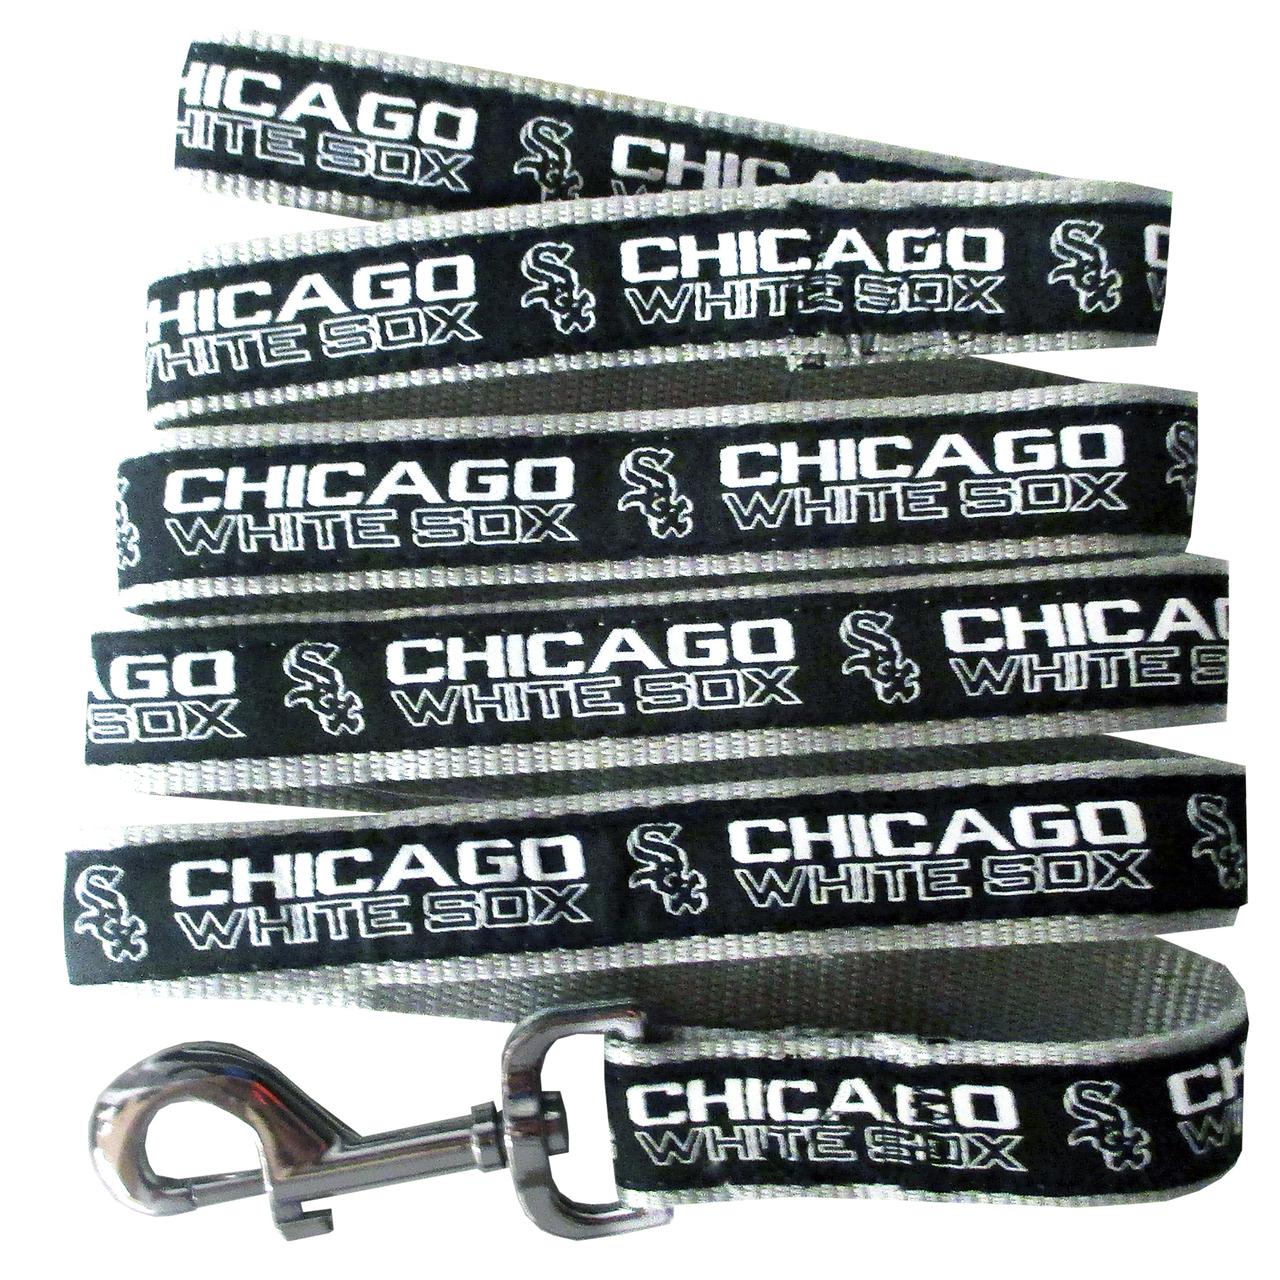 chicago-white-sox-dog-leash